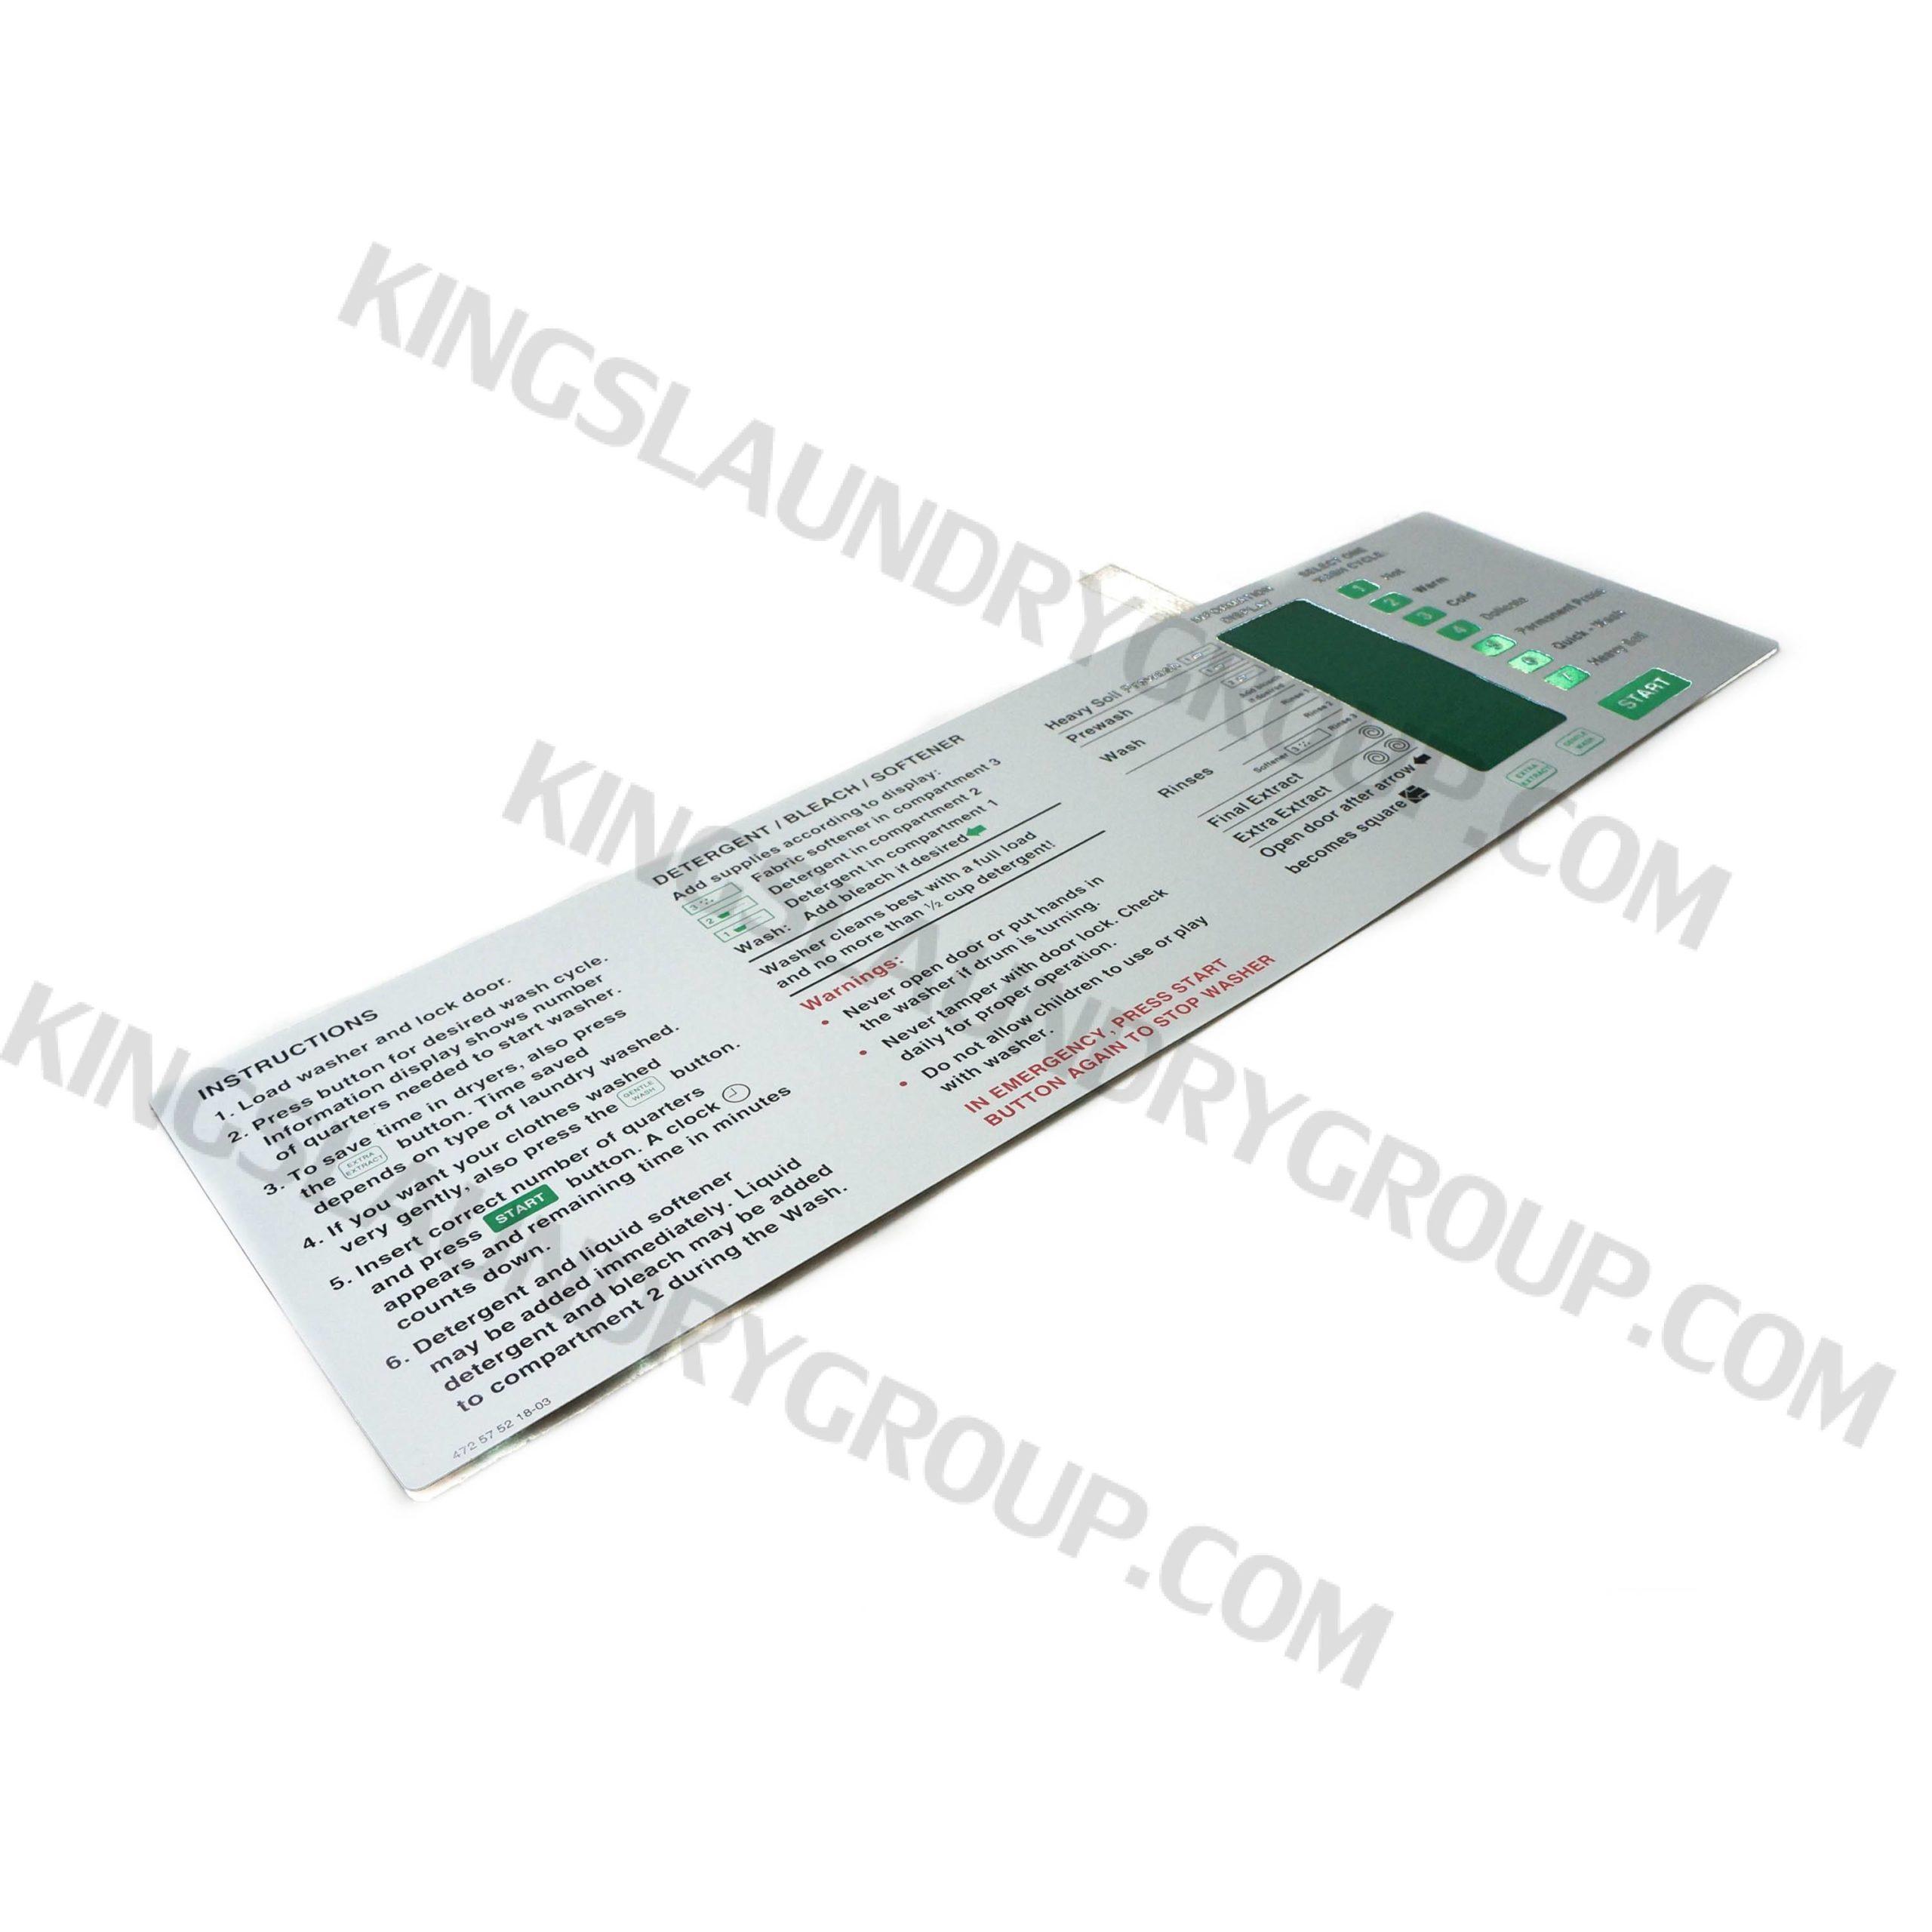 Wascomat # 575218 Gen-5 Emerald Touch Pad